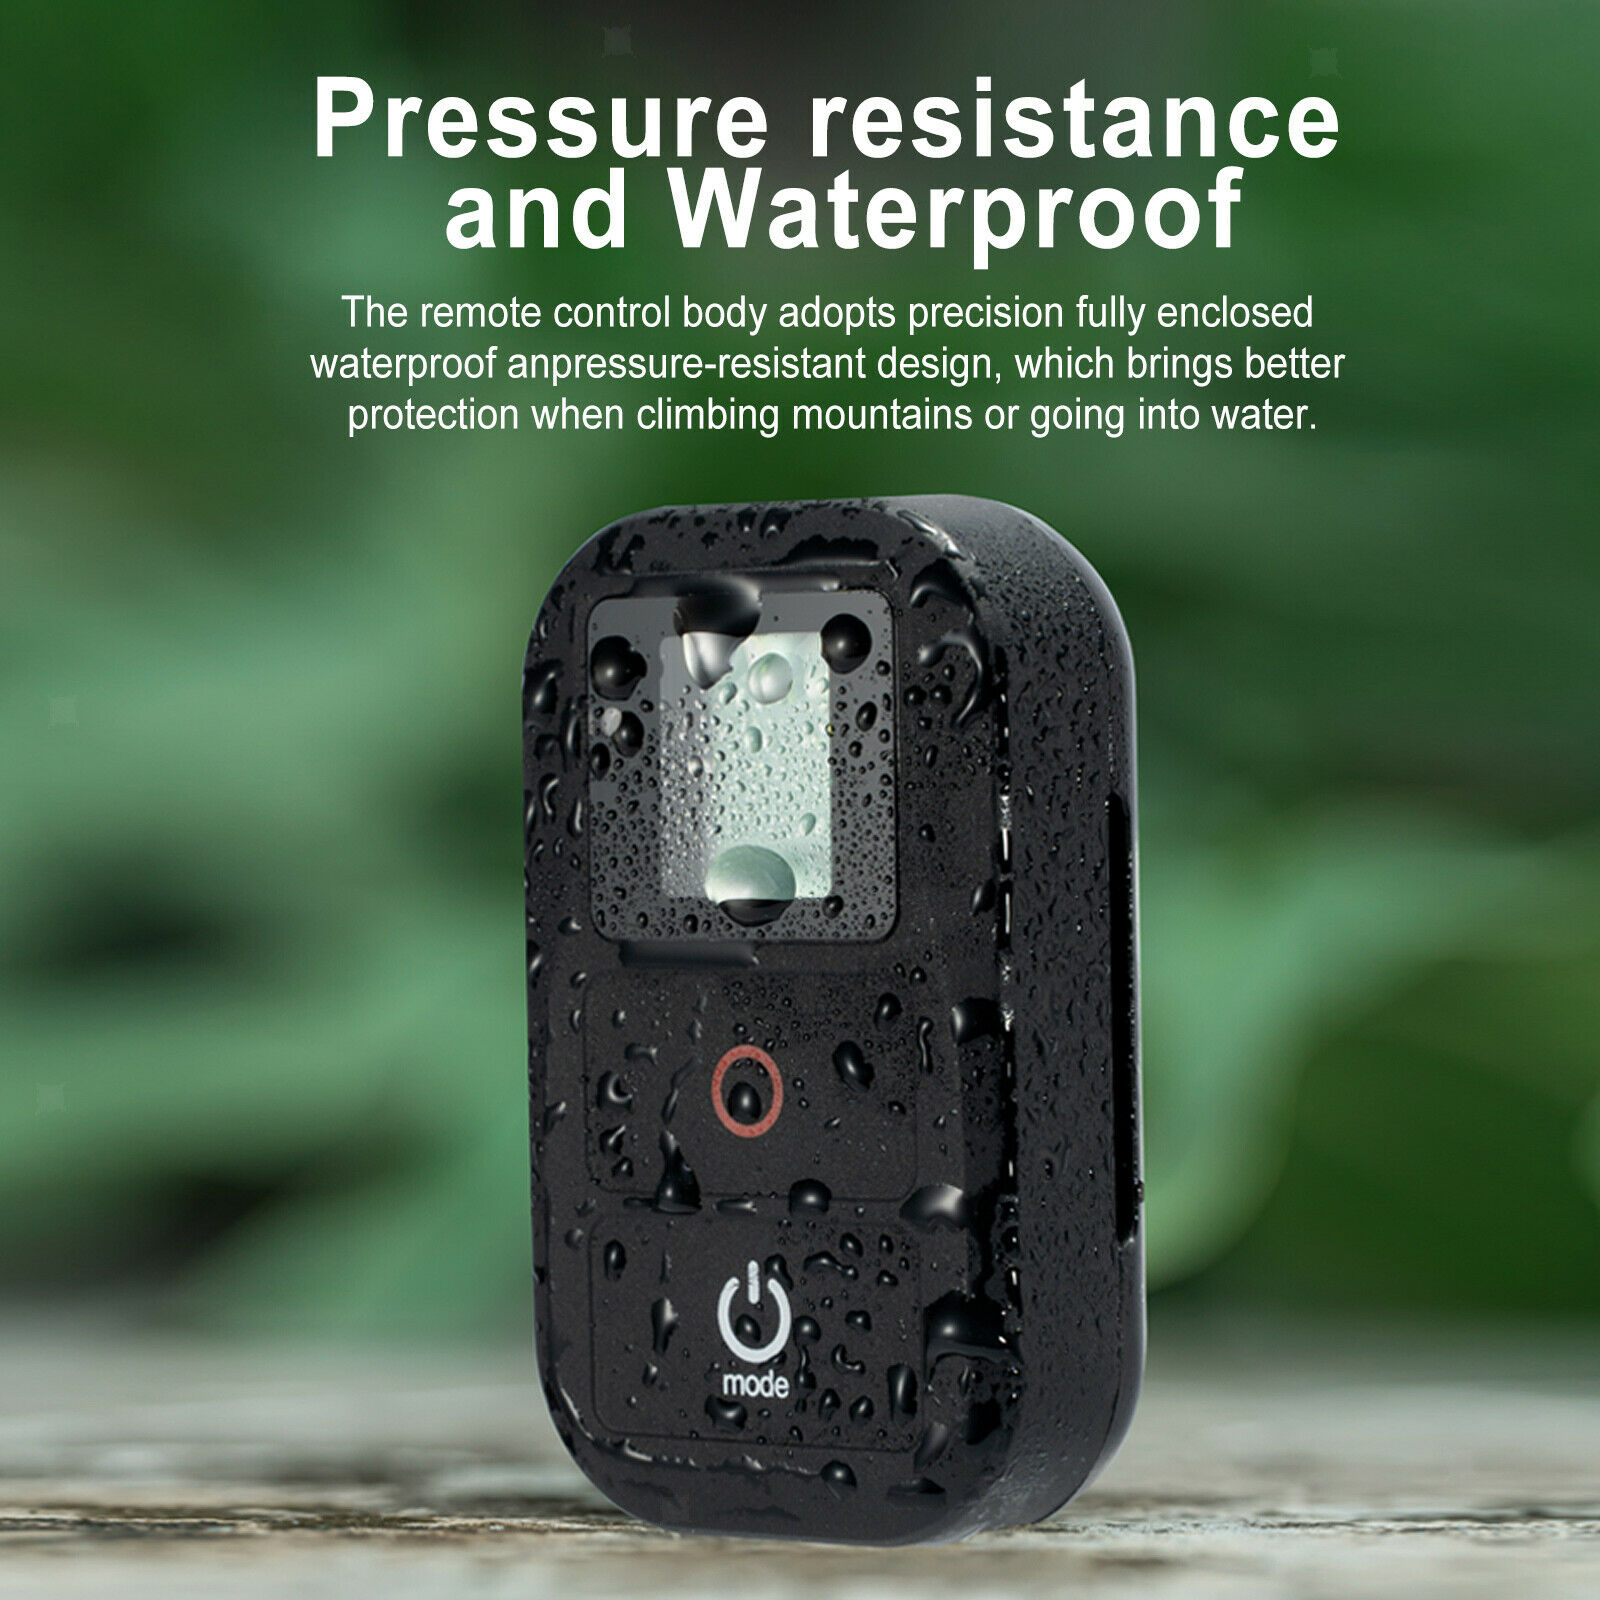 40M Smart WiFi Remote Control for Pro 8/7/6/5/4 Long Black